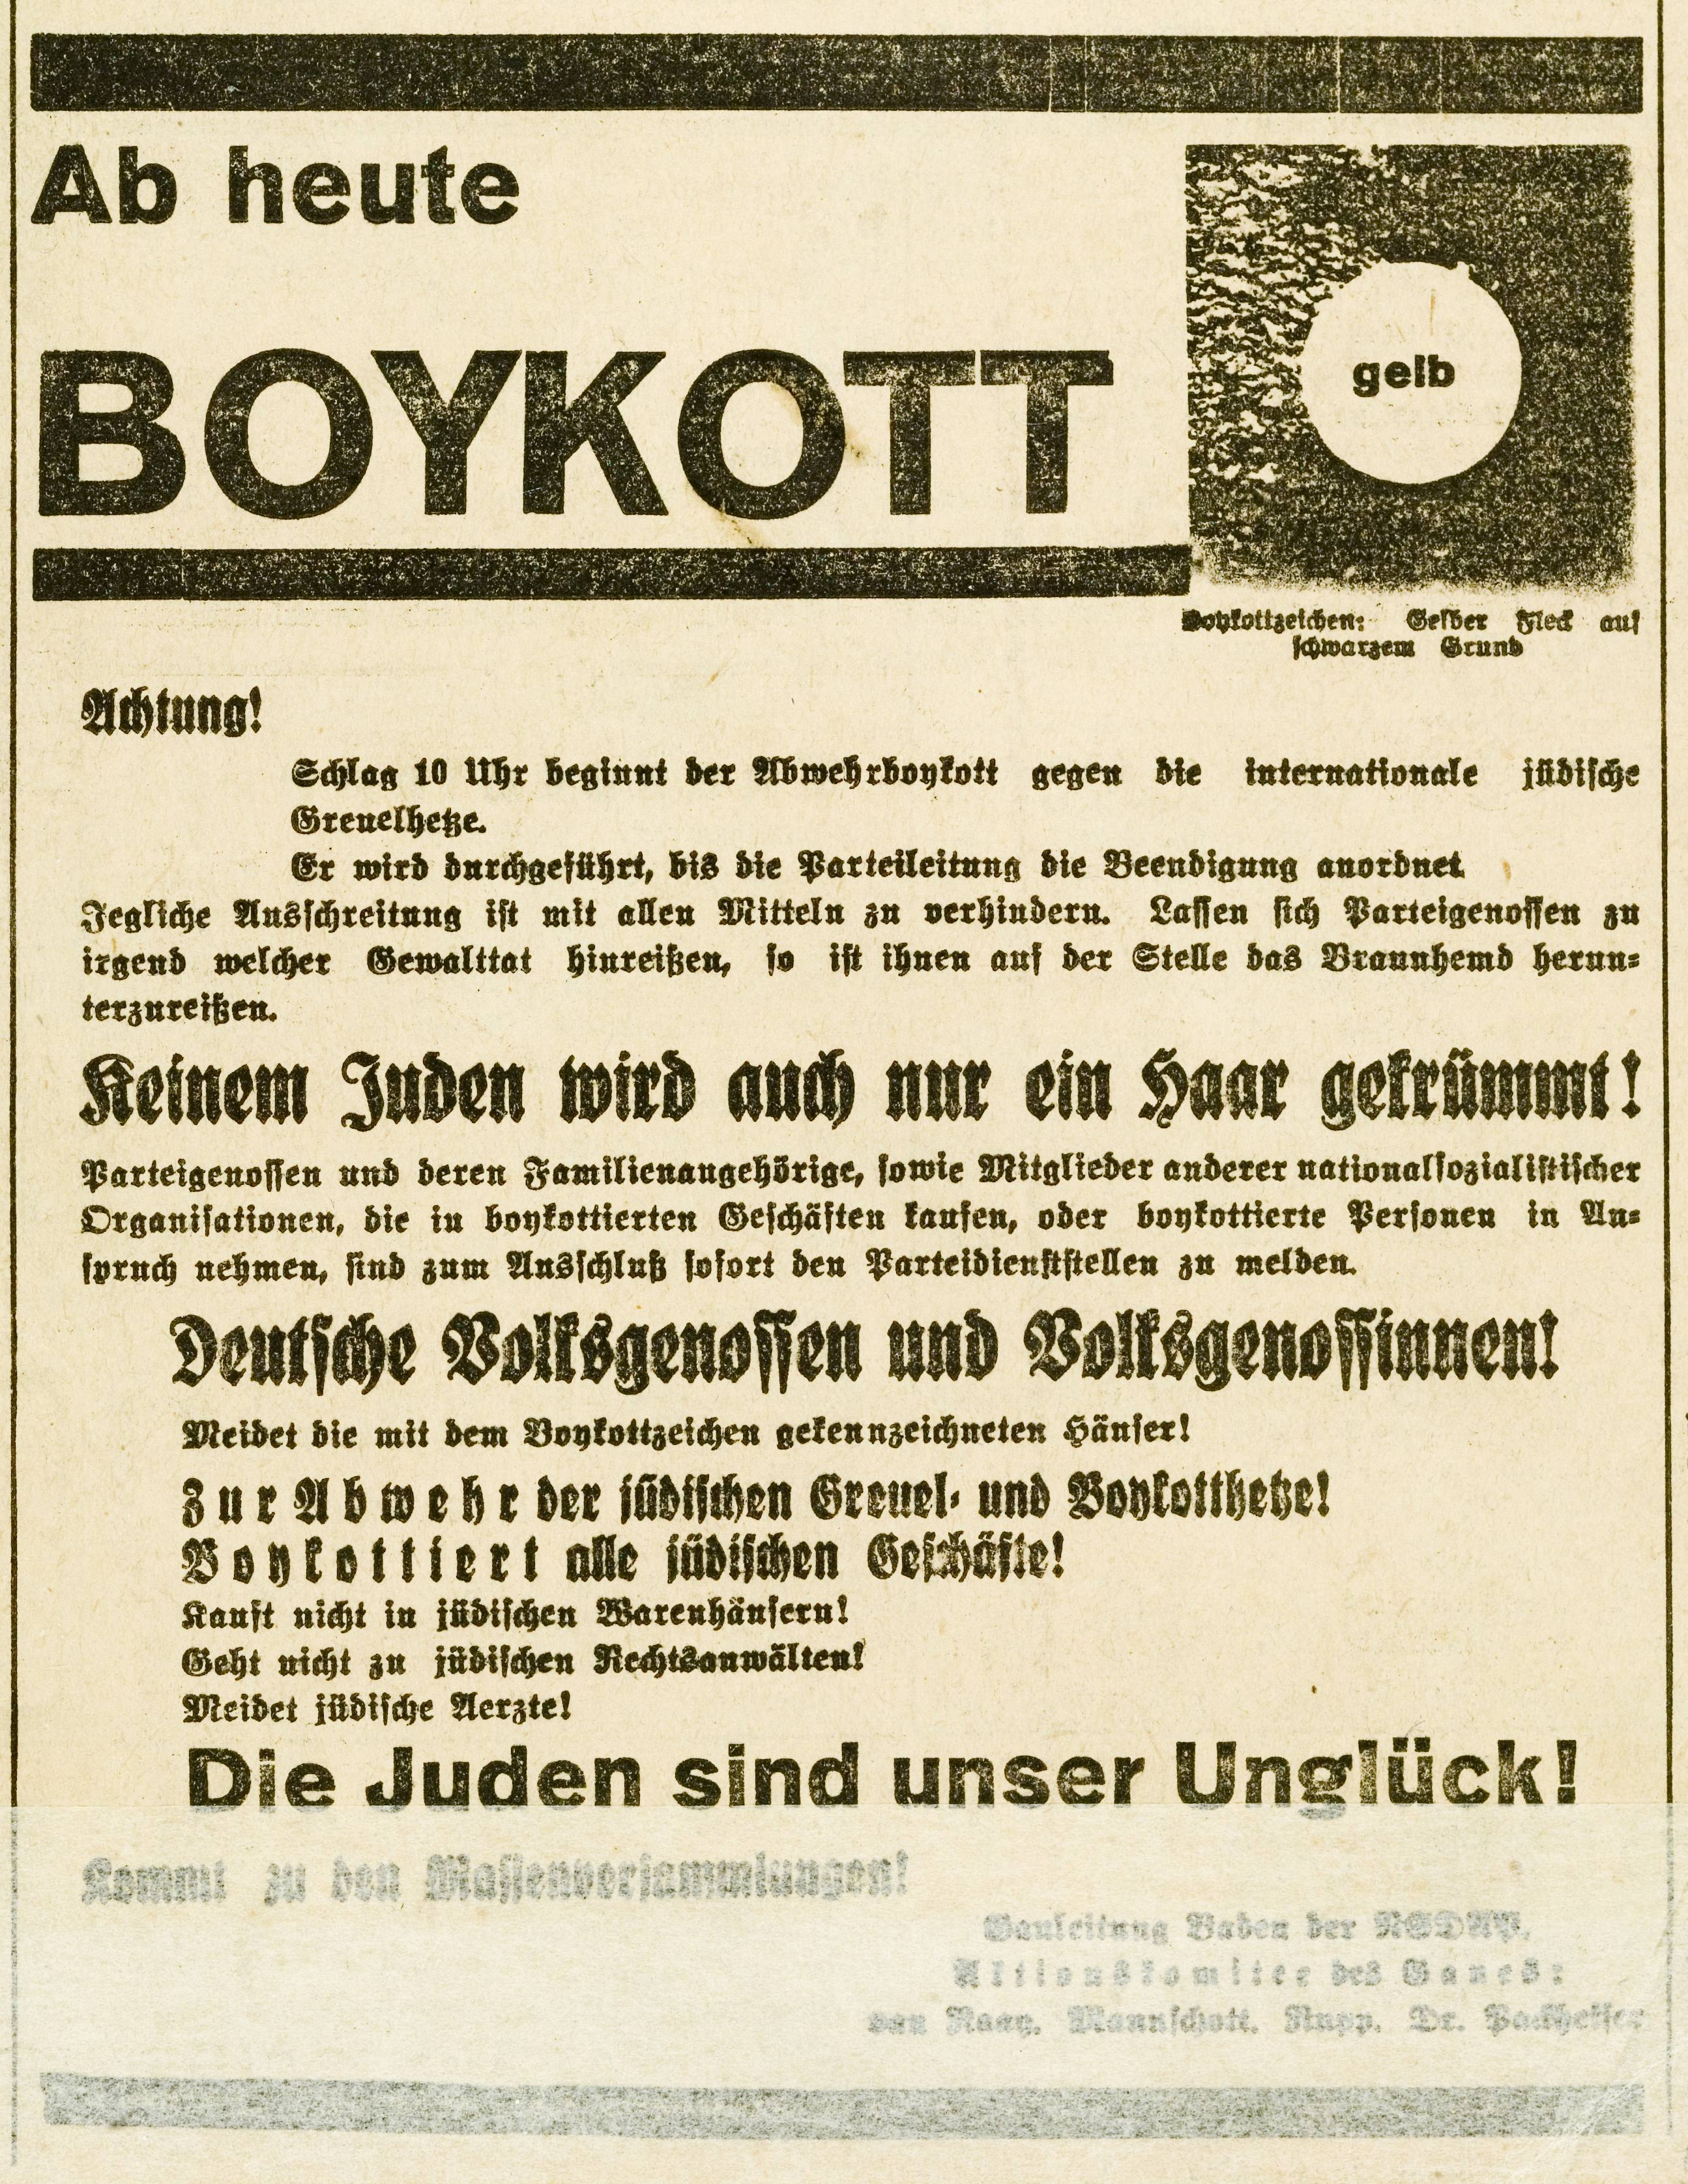 Aufruf zum Boykott jüdischer Geschäfte